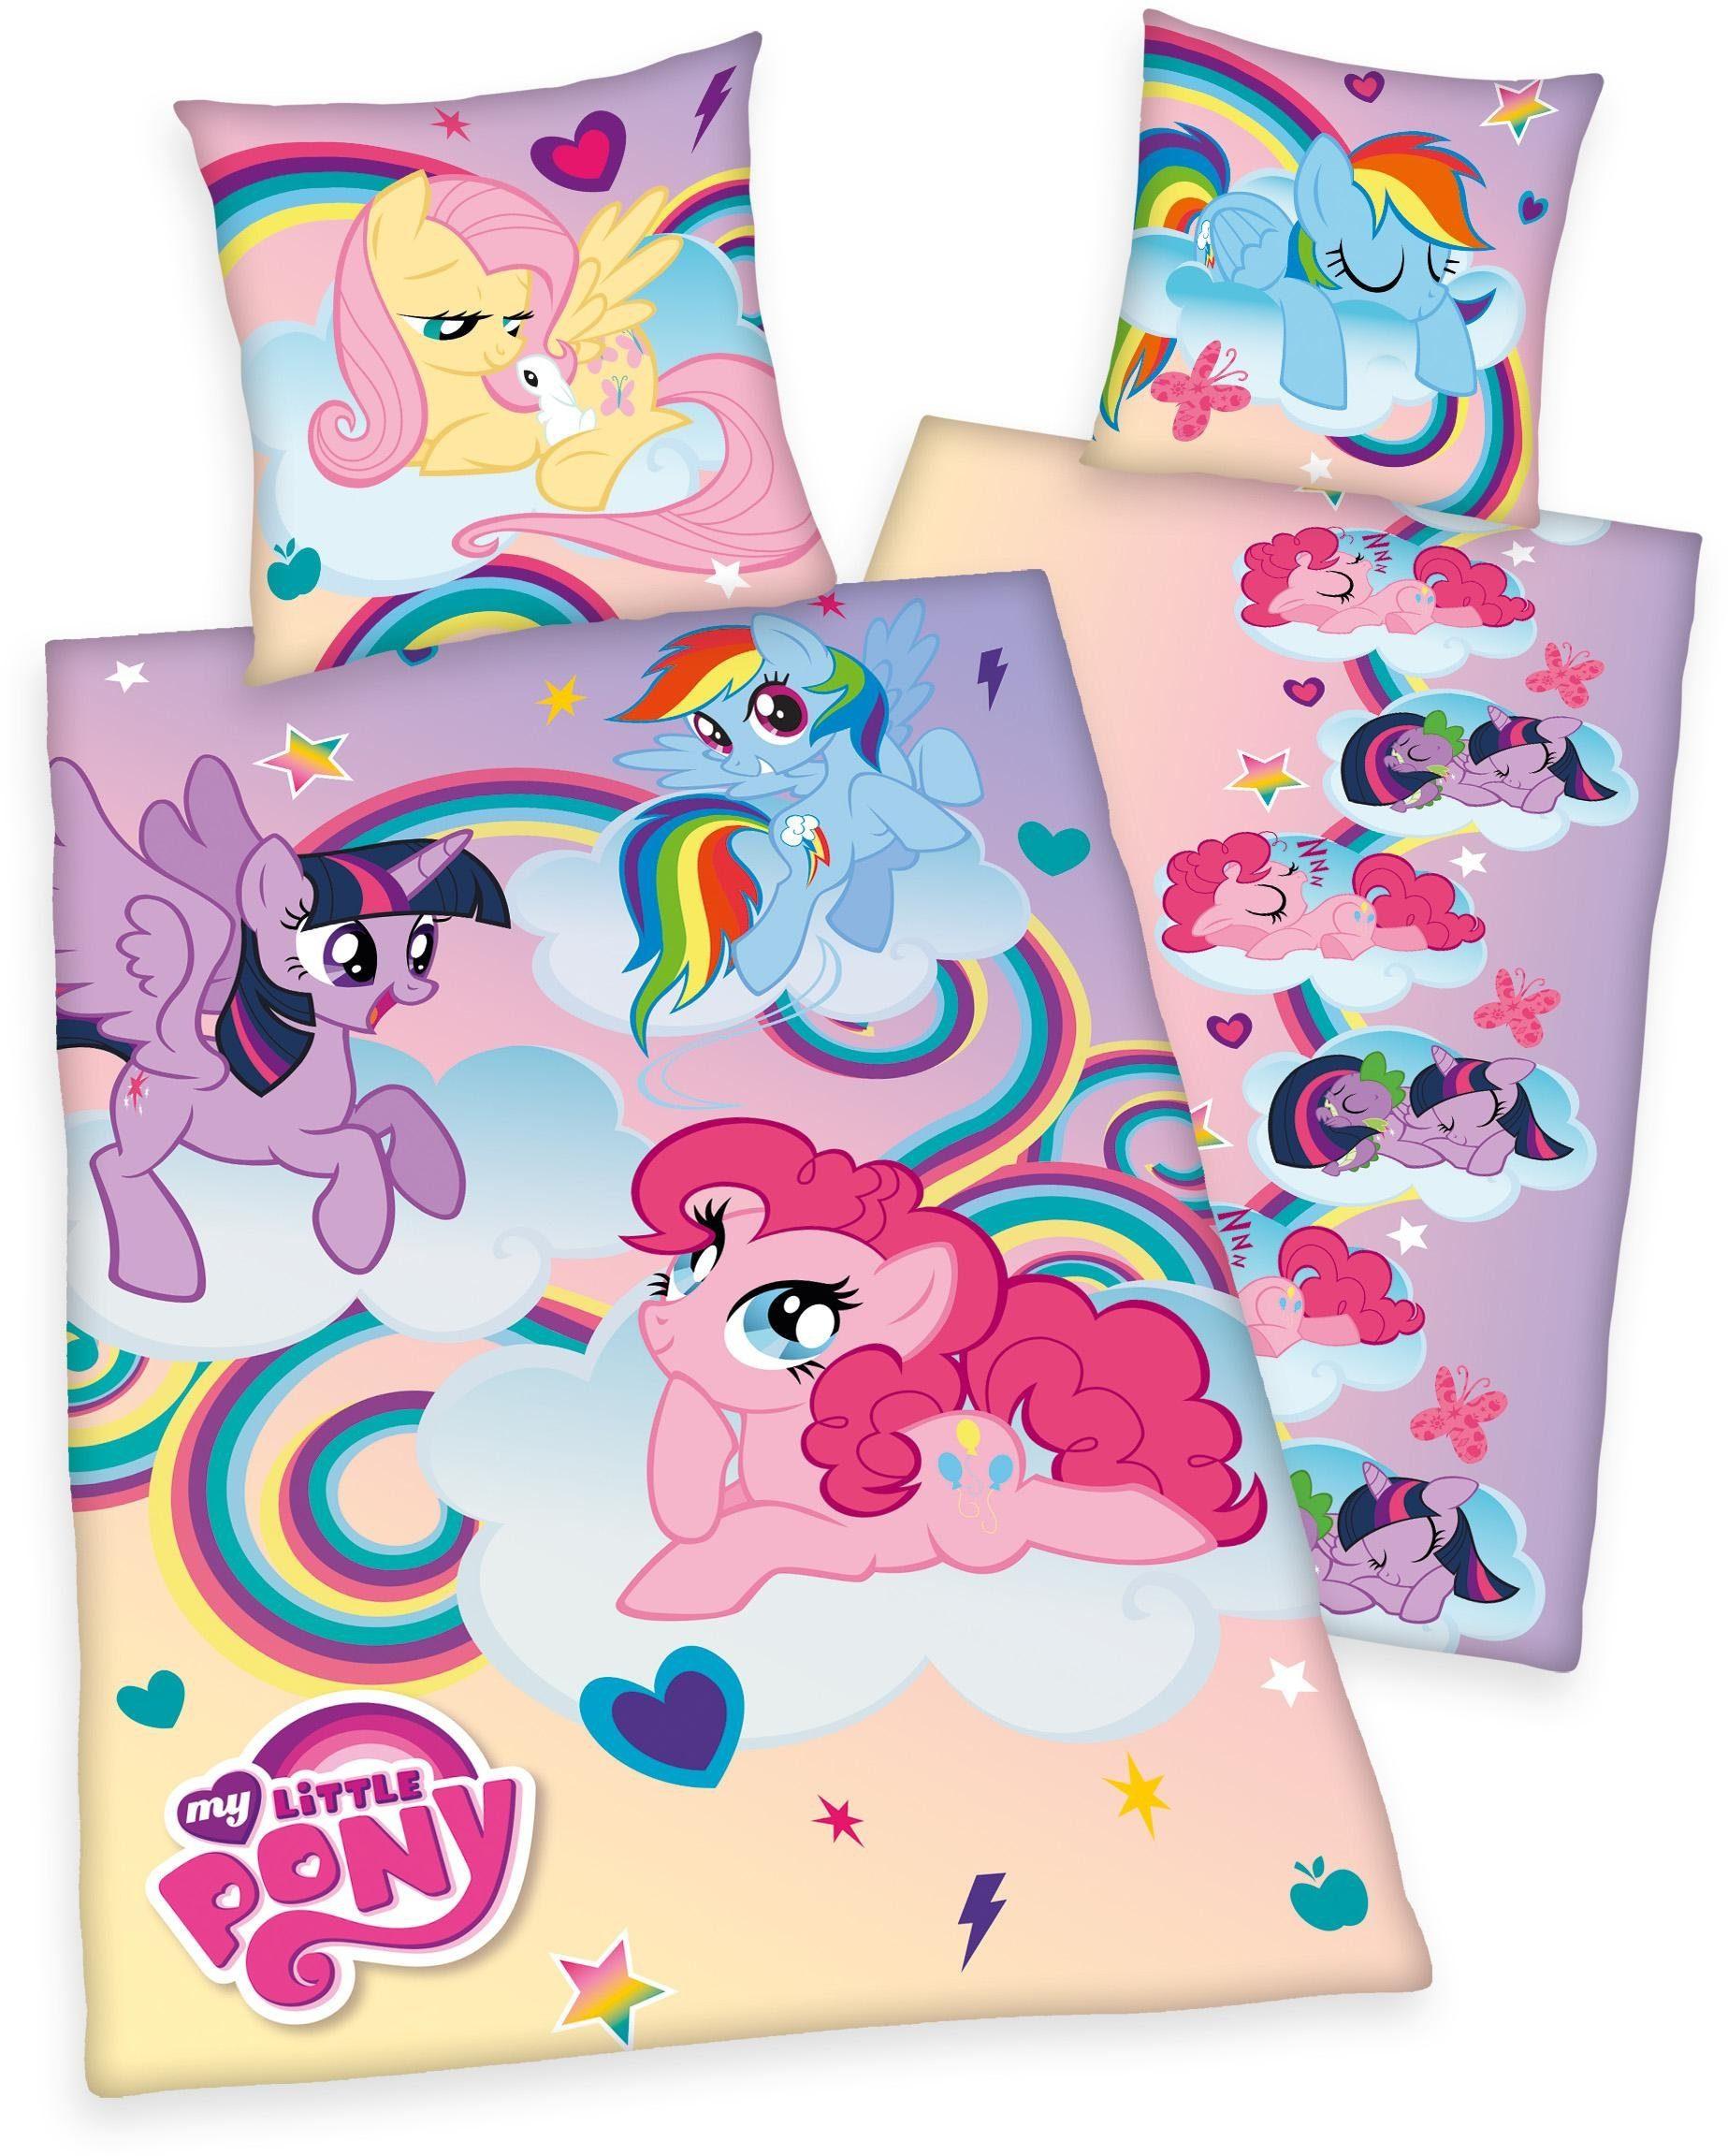 Kinderbettwäsche, My little Pony, »Ponyfarm«, mit Ponys